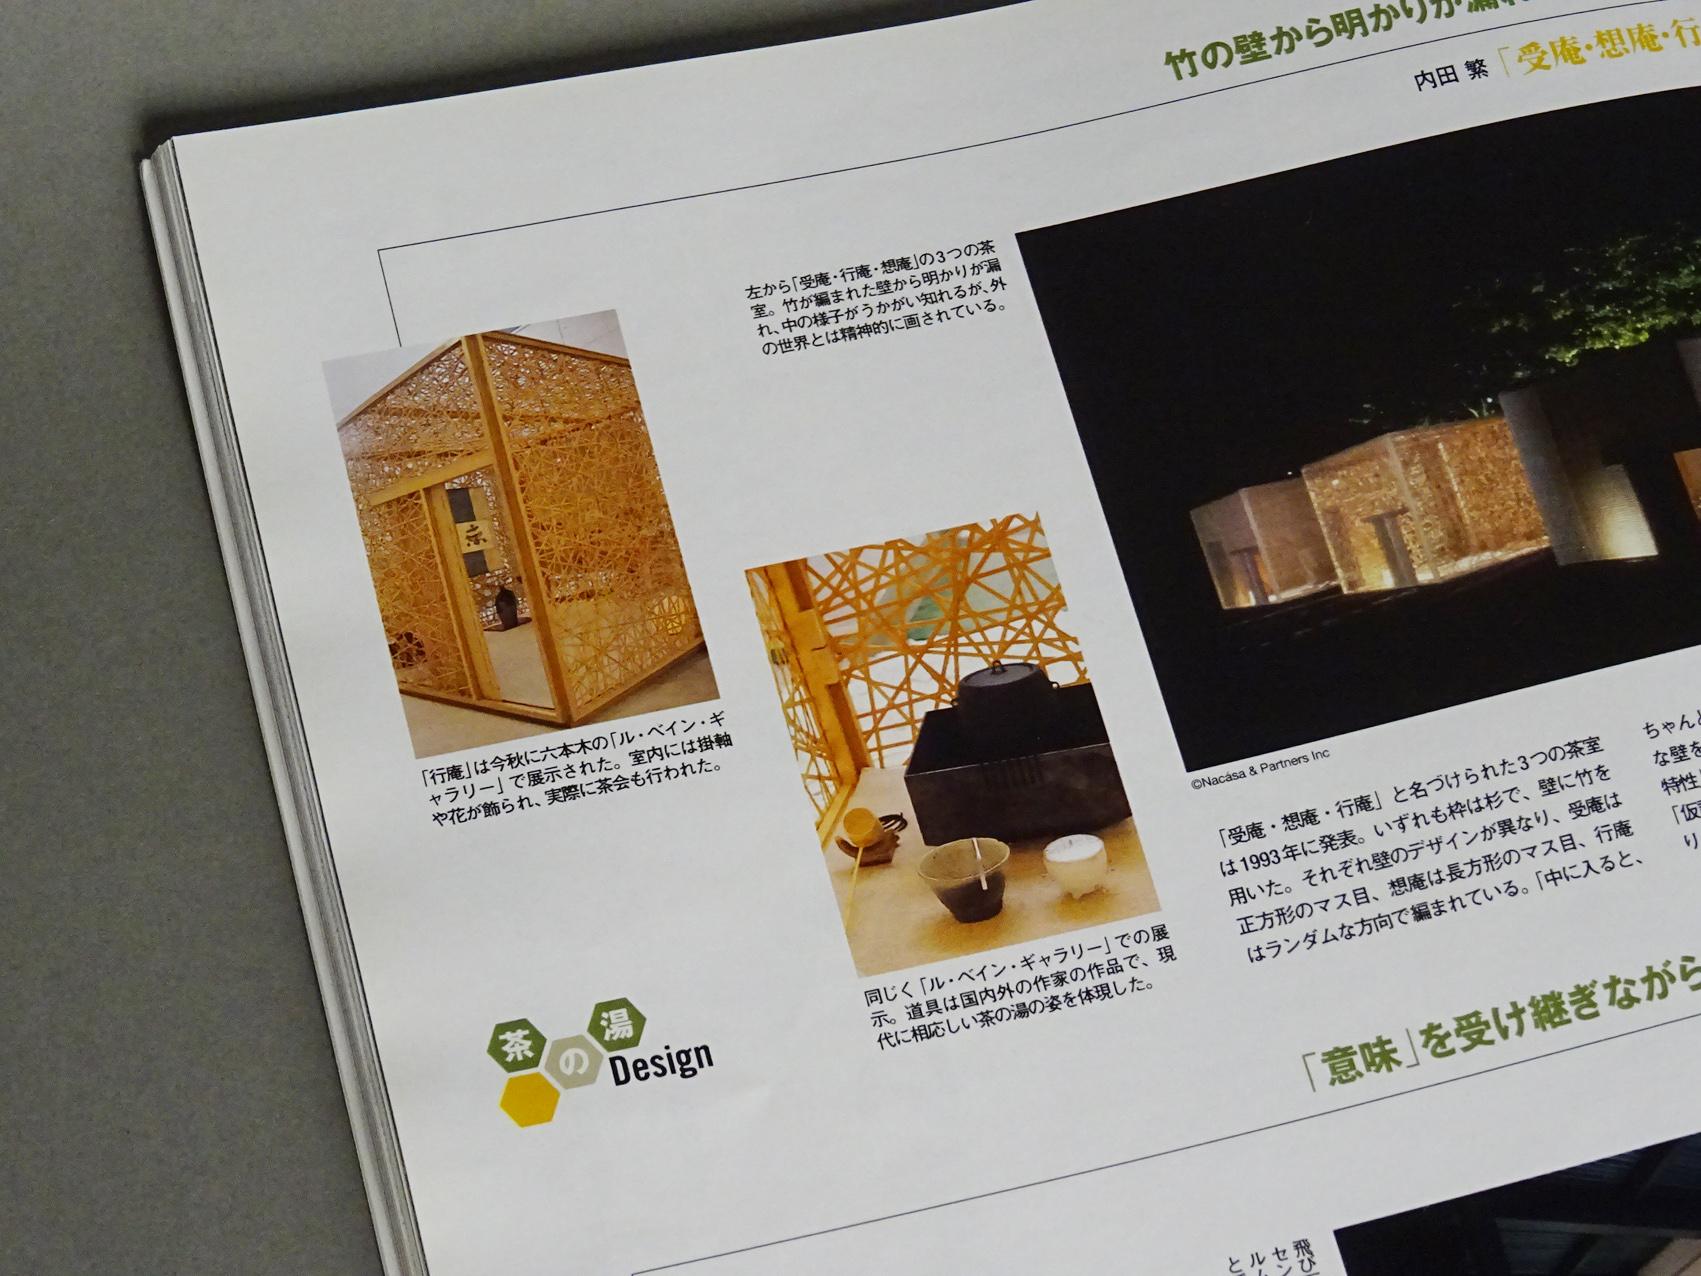 pen Magazin 2007 zum Thema Teeraum Design